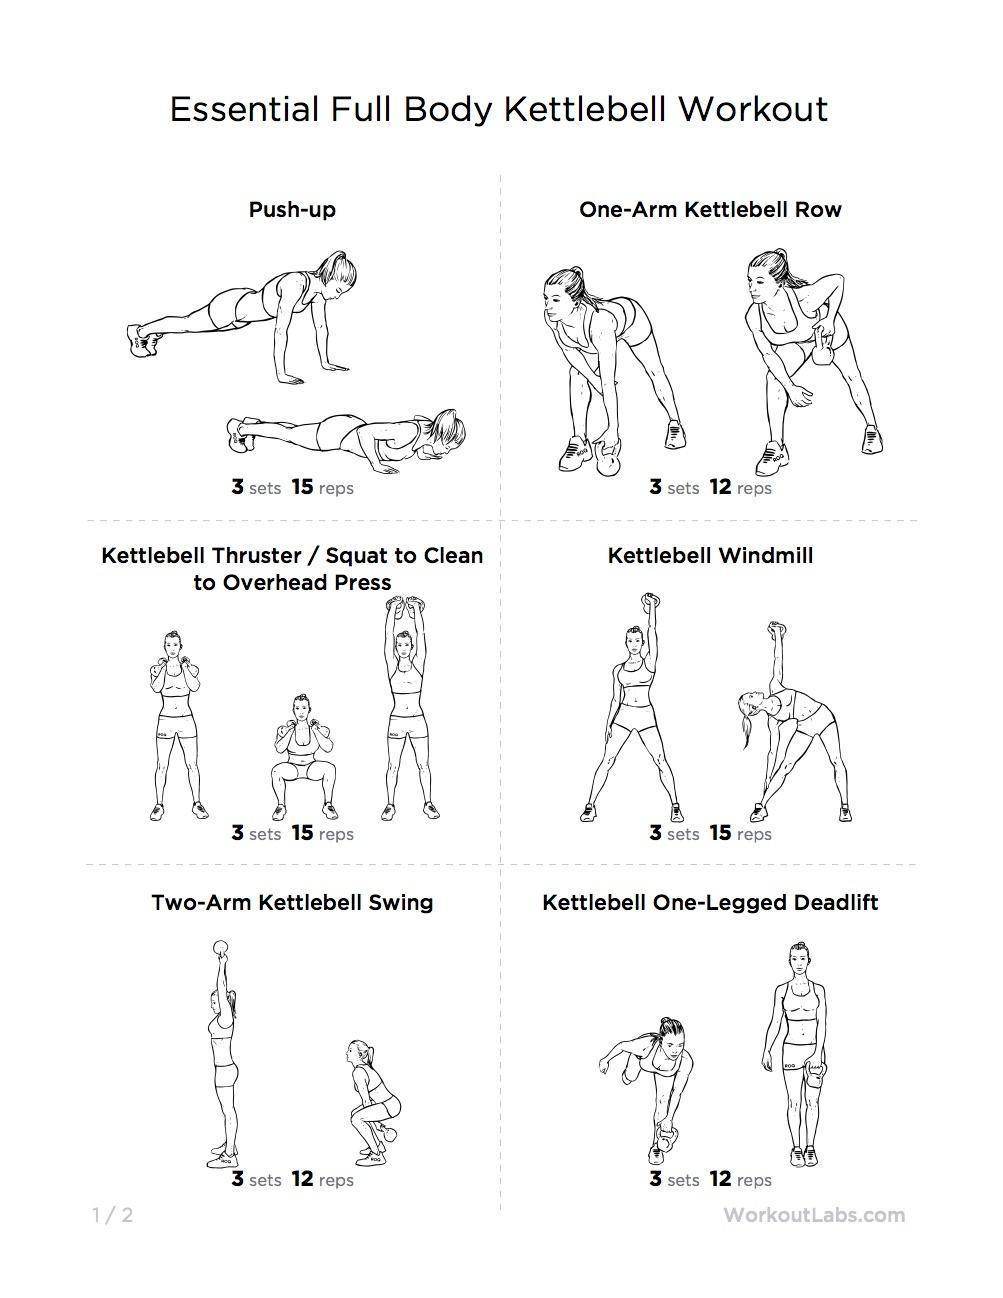 Printable Workout Plans For Men | Hauck Mansion - Free Printable Workout Plans